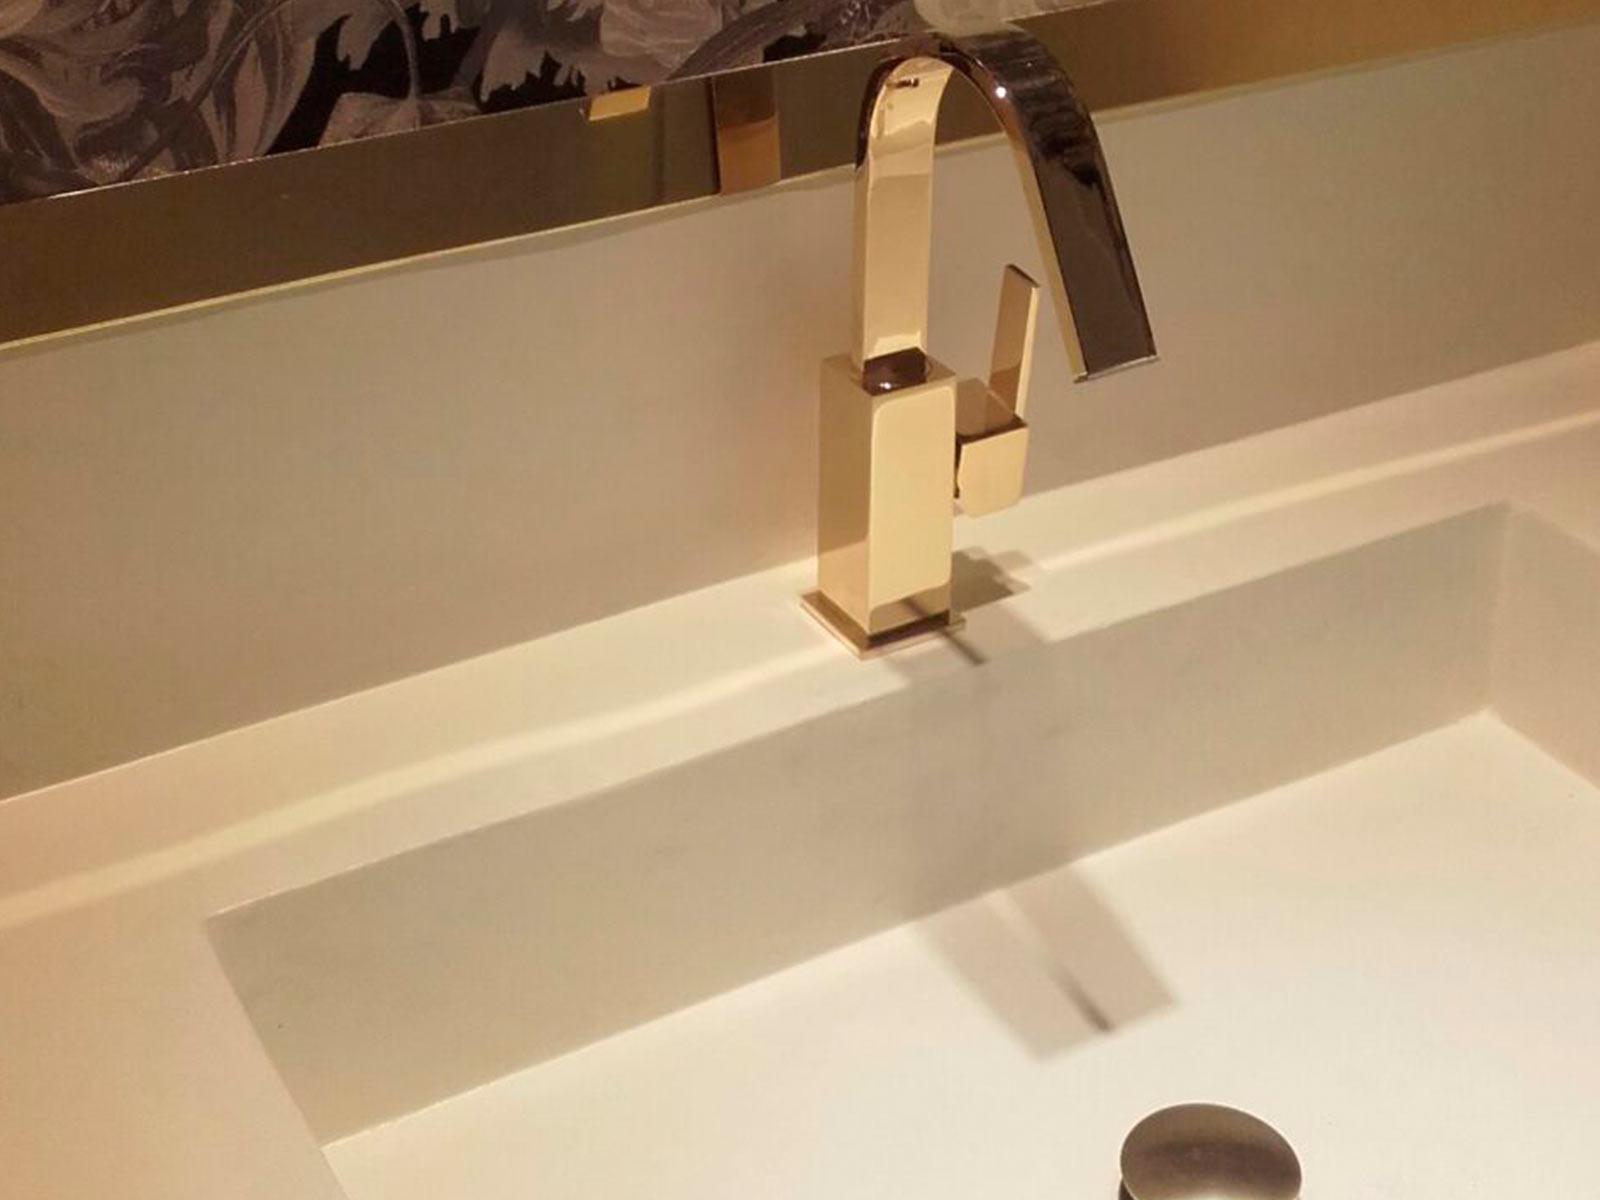 Monomando lavabo Matisse, acabado oro brillo.